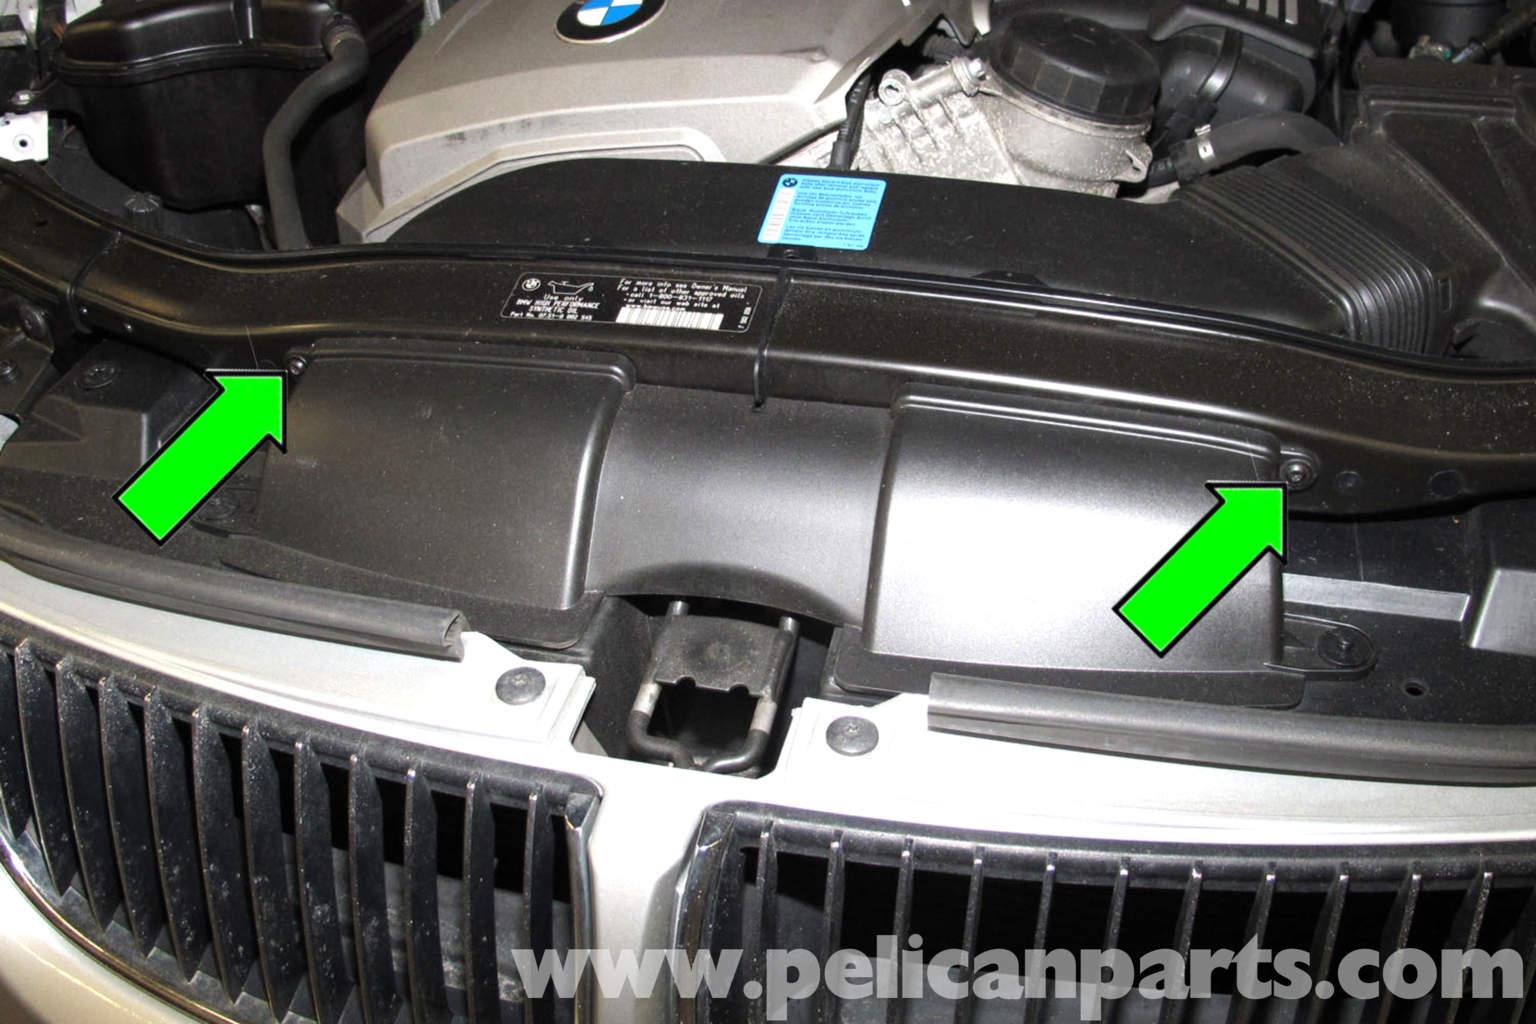 Battery Wiring Diagram 2007 Bmw 327i Schematic Diagrams E90 Alternator Replacement E91 E92 E93 Pelican Parts Diy 328i Radiator